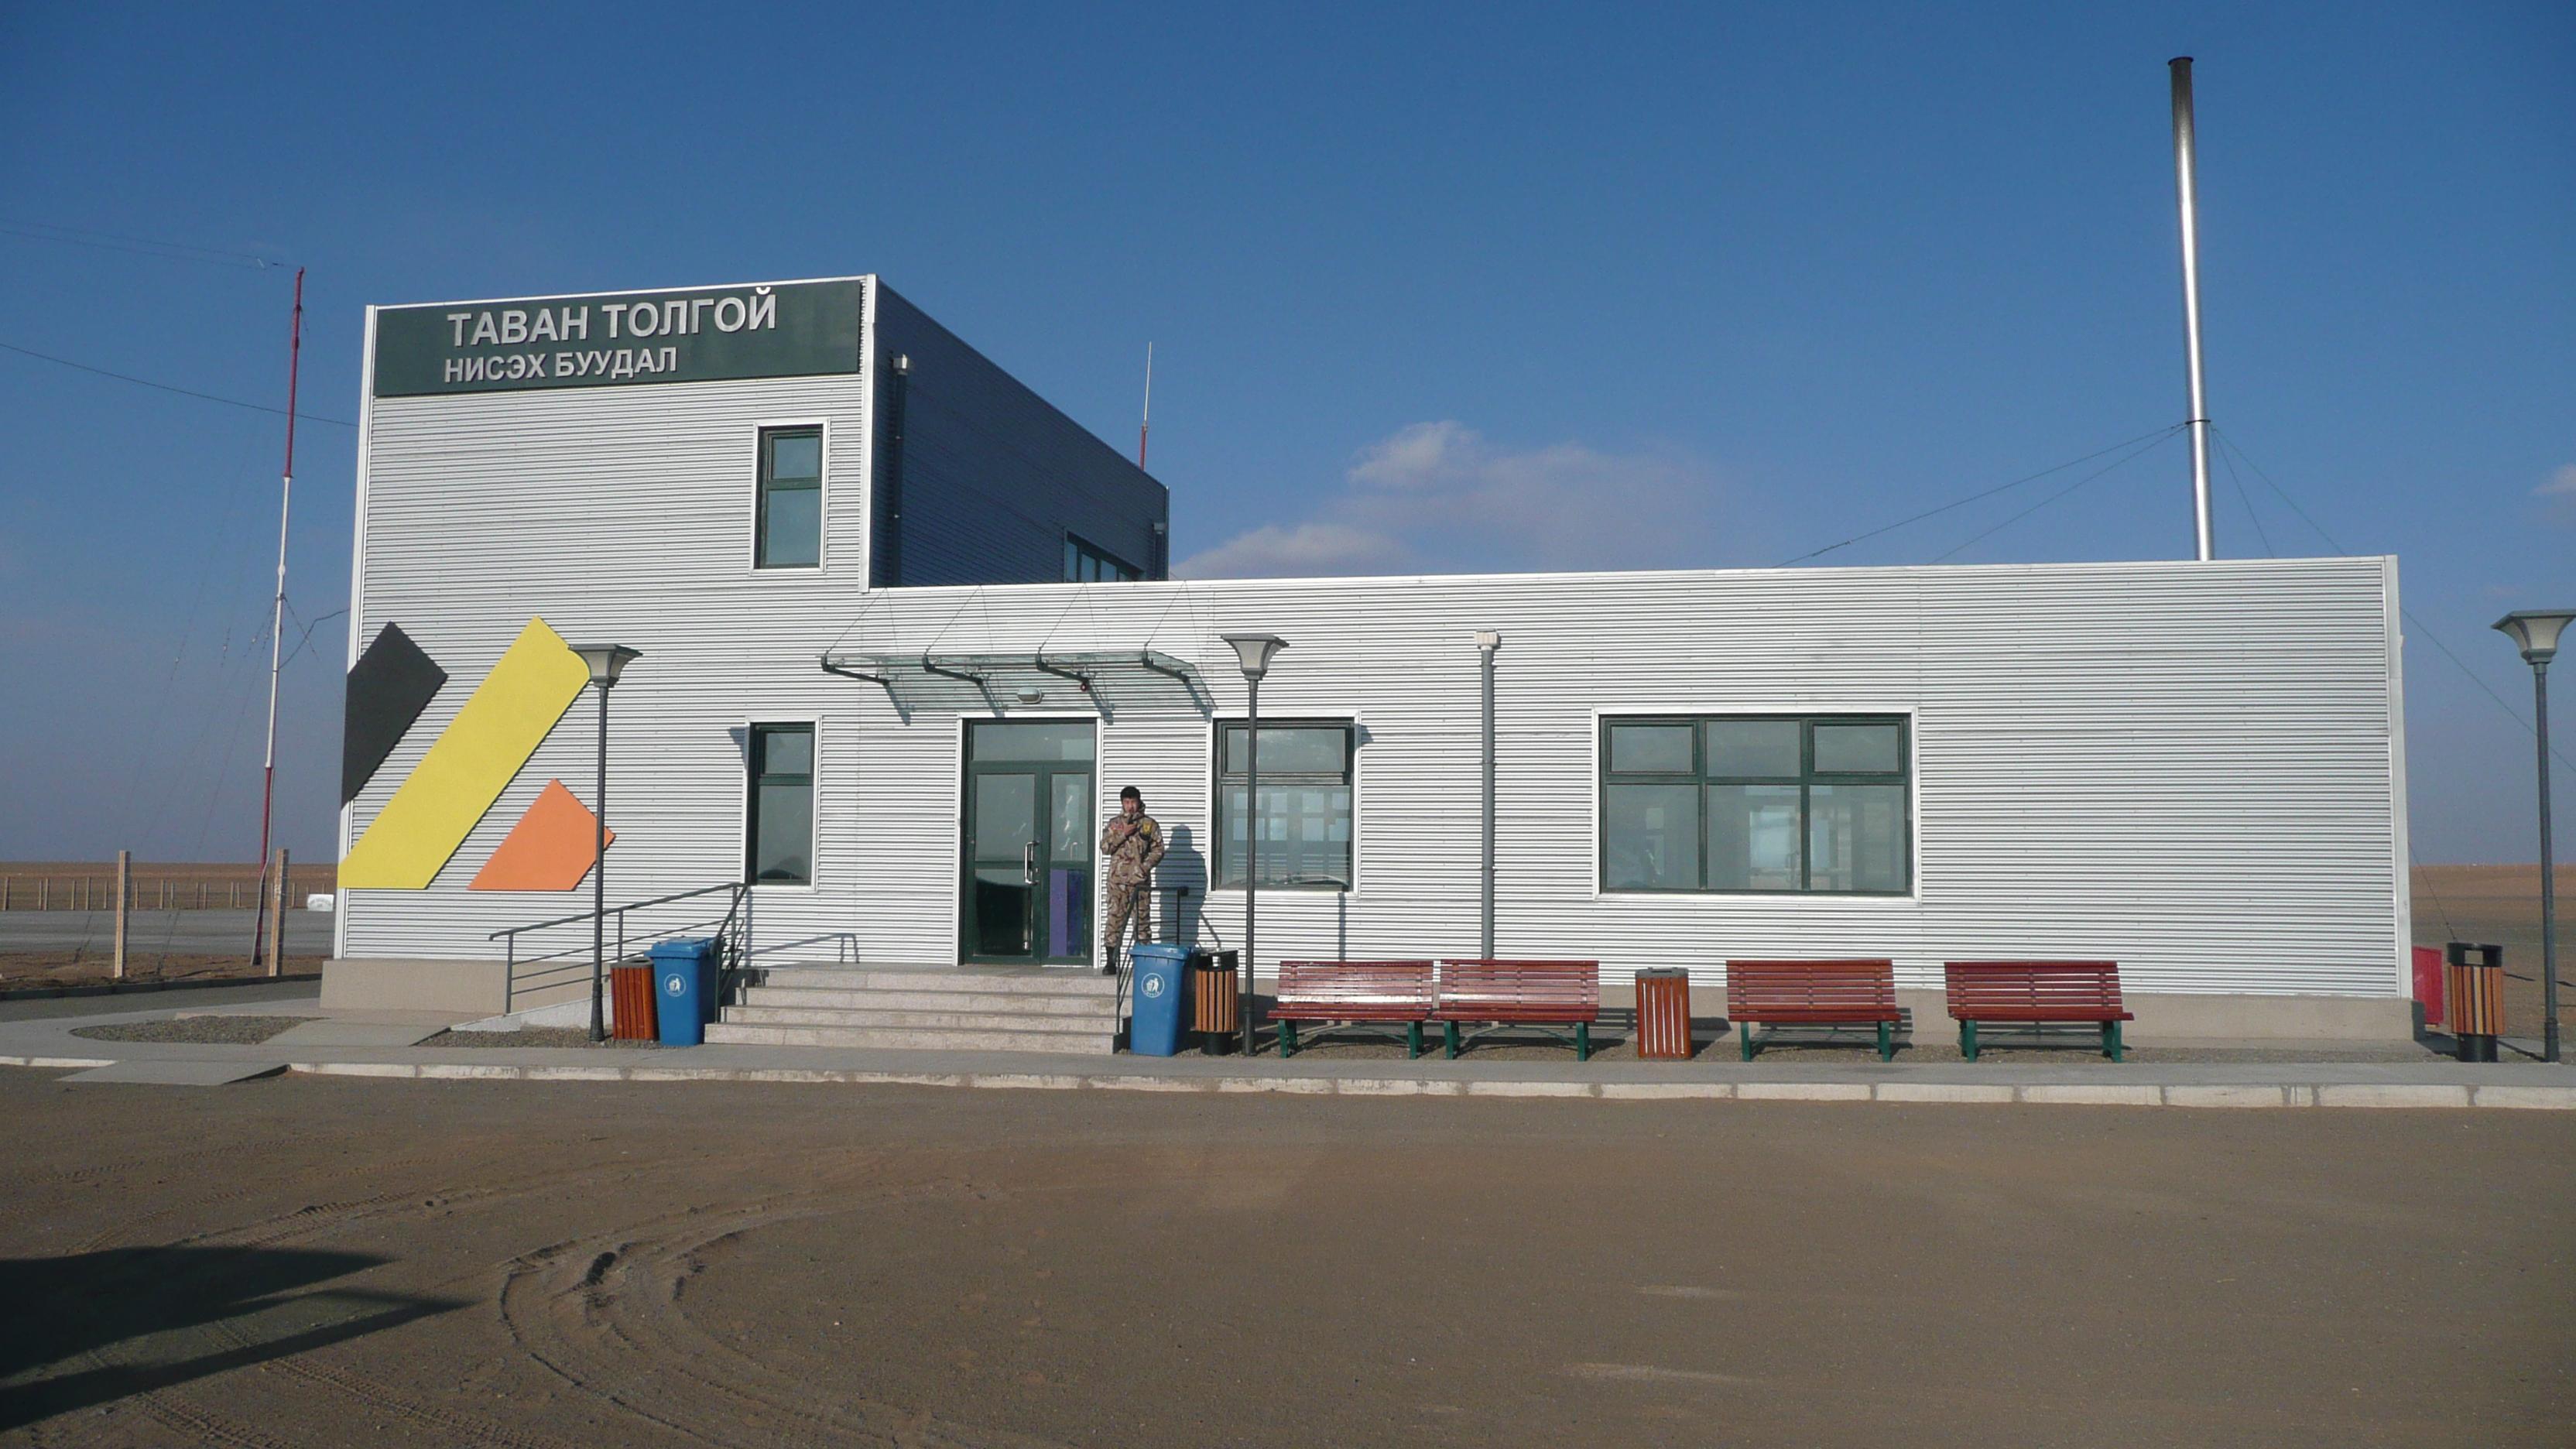 File:Airport UHG Tsogttsetsii 2.JPG - Wikimedia Commons